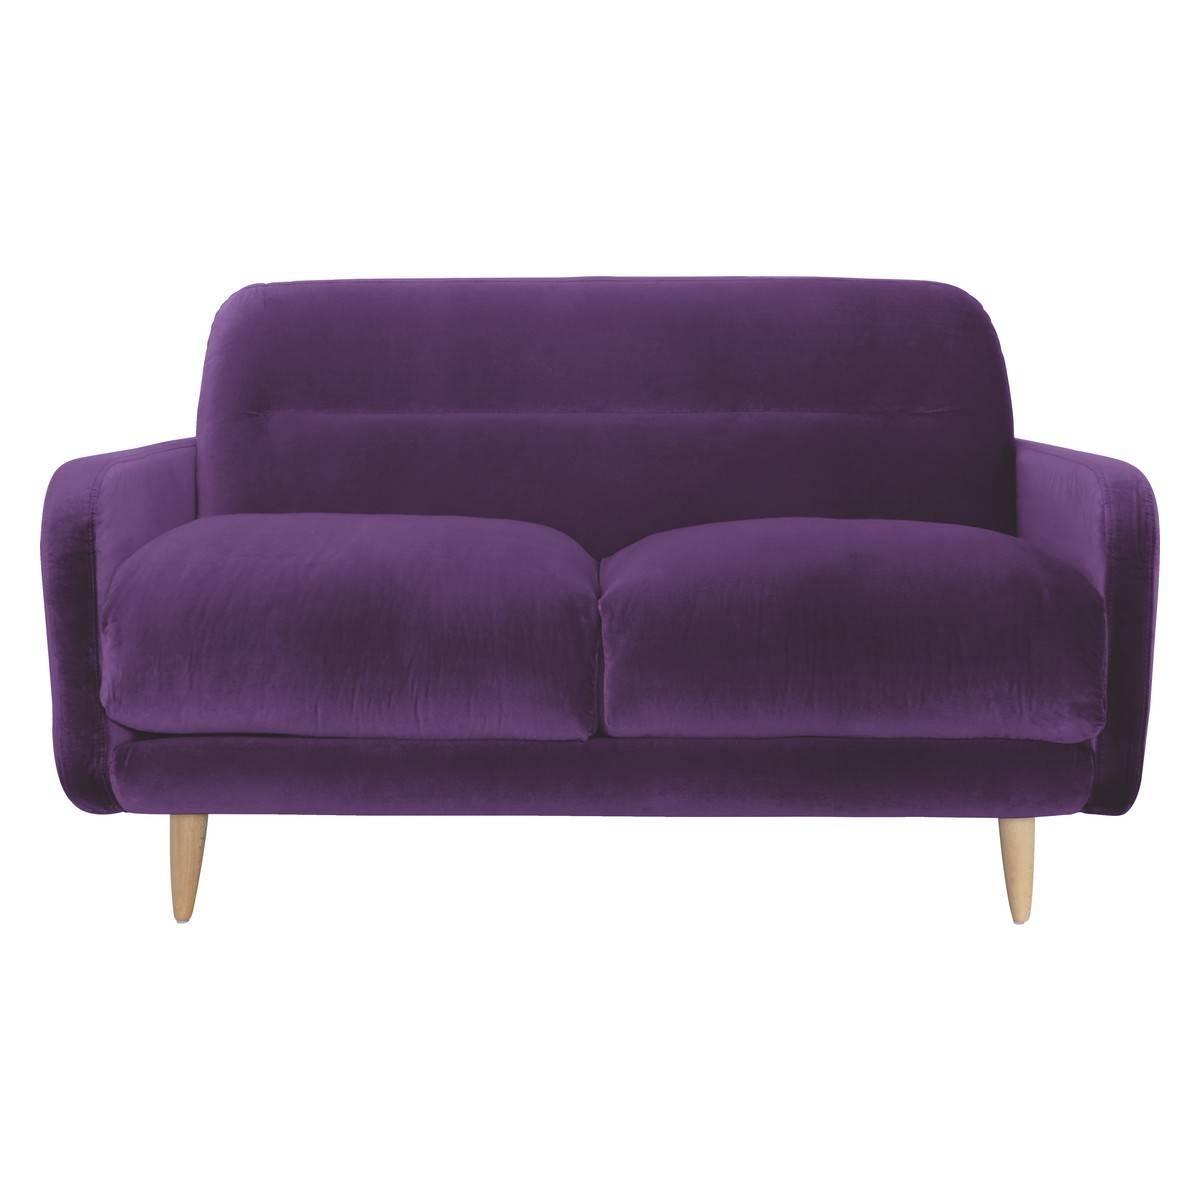 purple velvet sofa bed uk cheap sectional sofas in phoenix az 30 best collection of